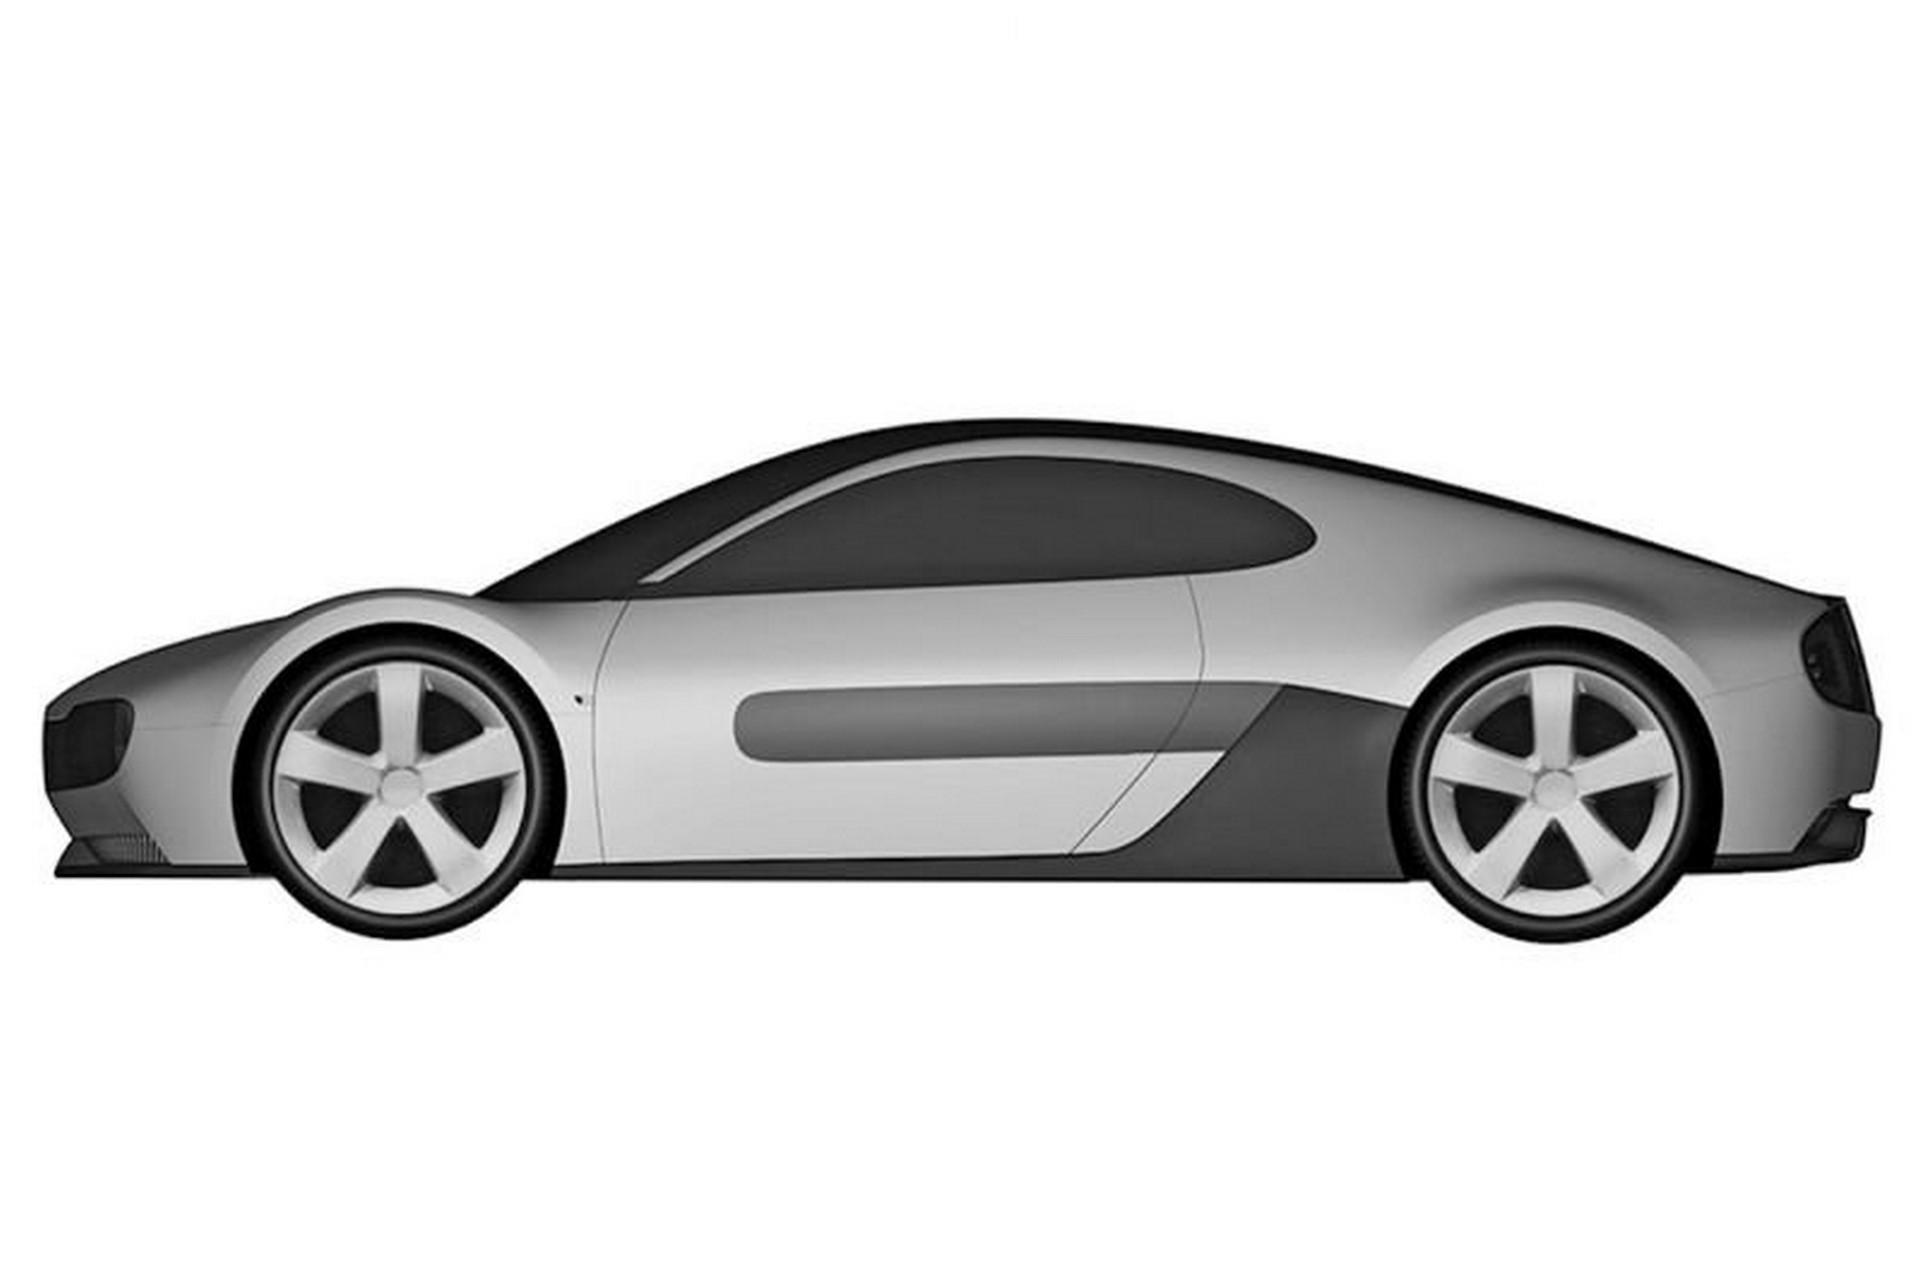 Honda-Electric-Sports-Car-patents-6